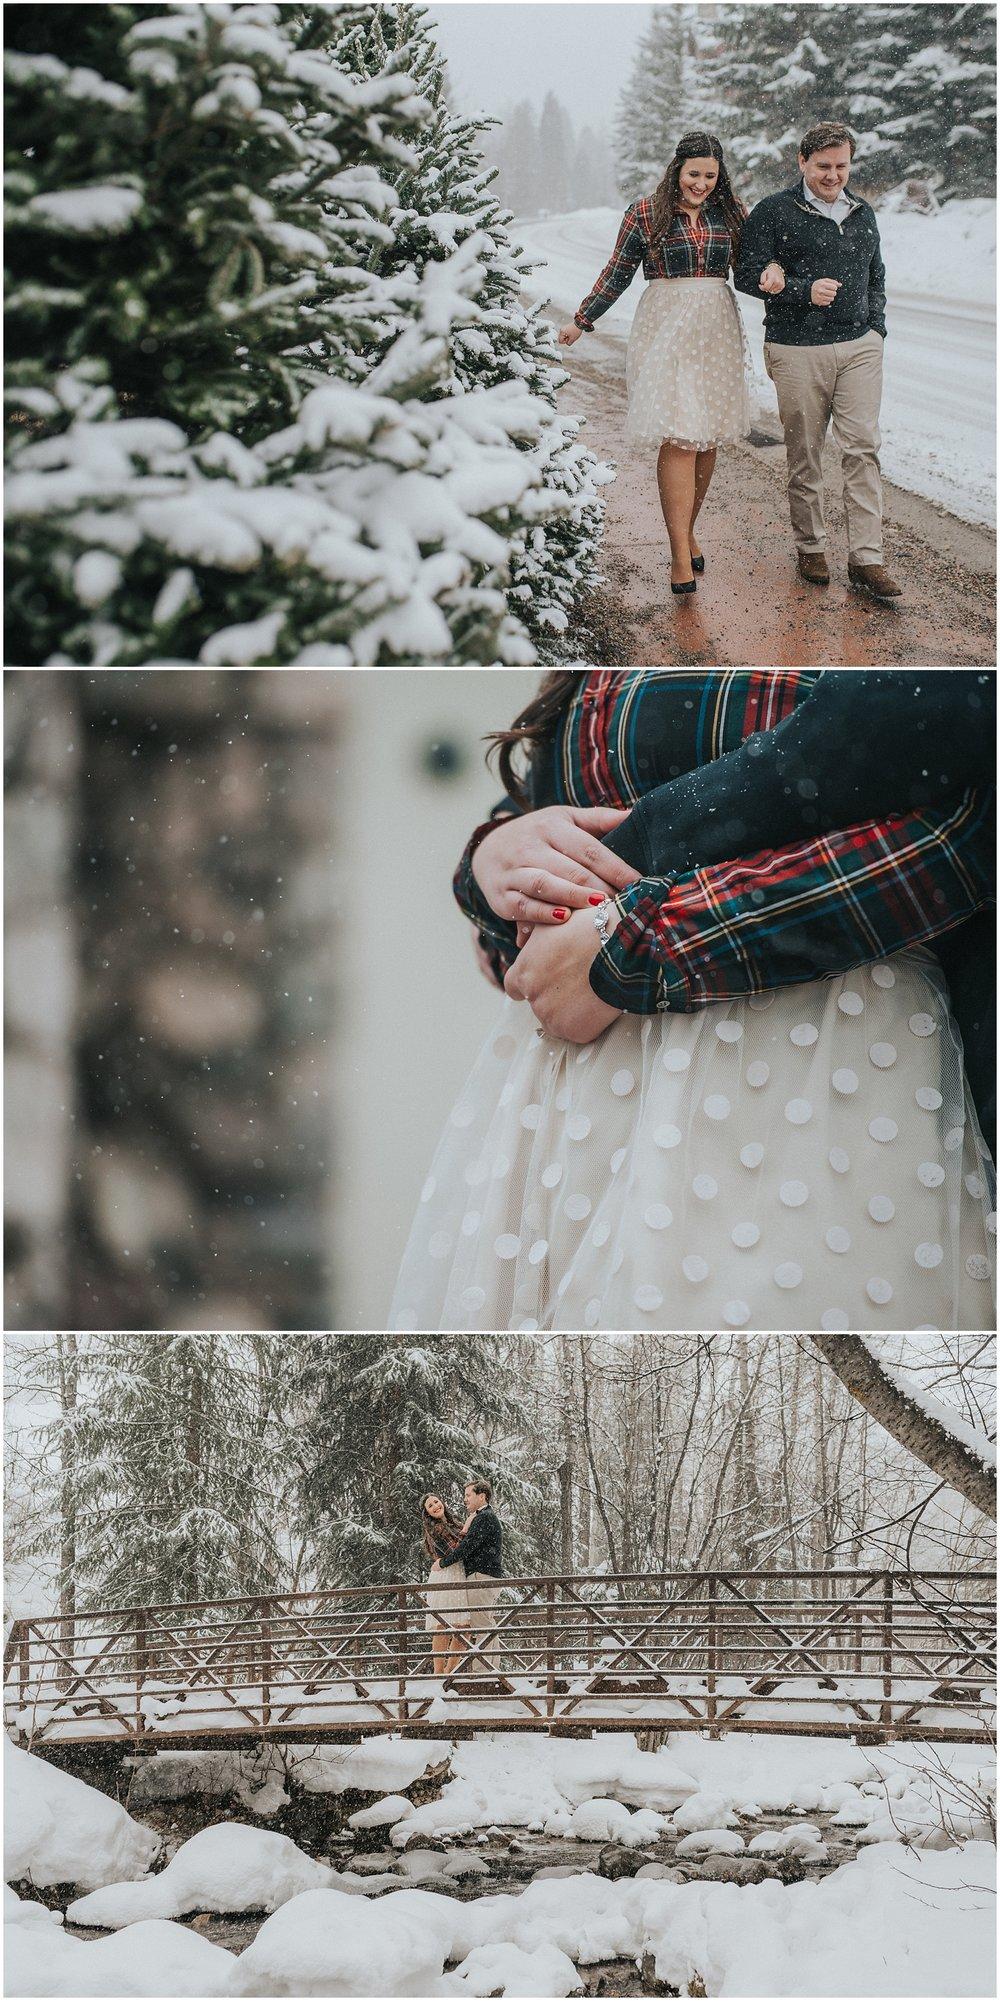 beavercreek_colorado_winter_engagement_photos_0002.jpg